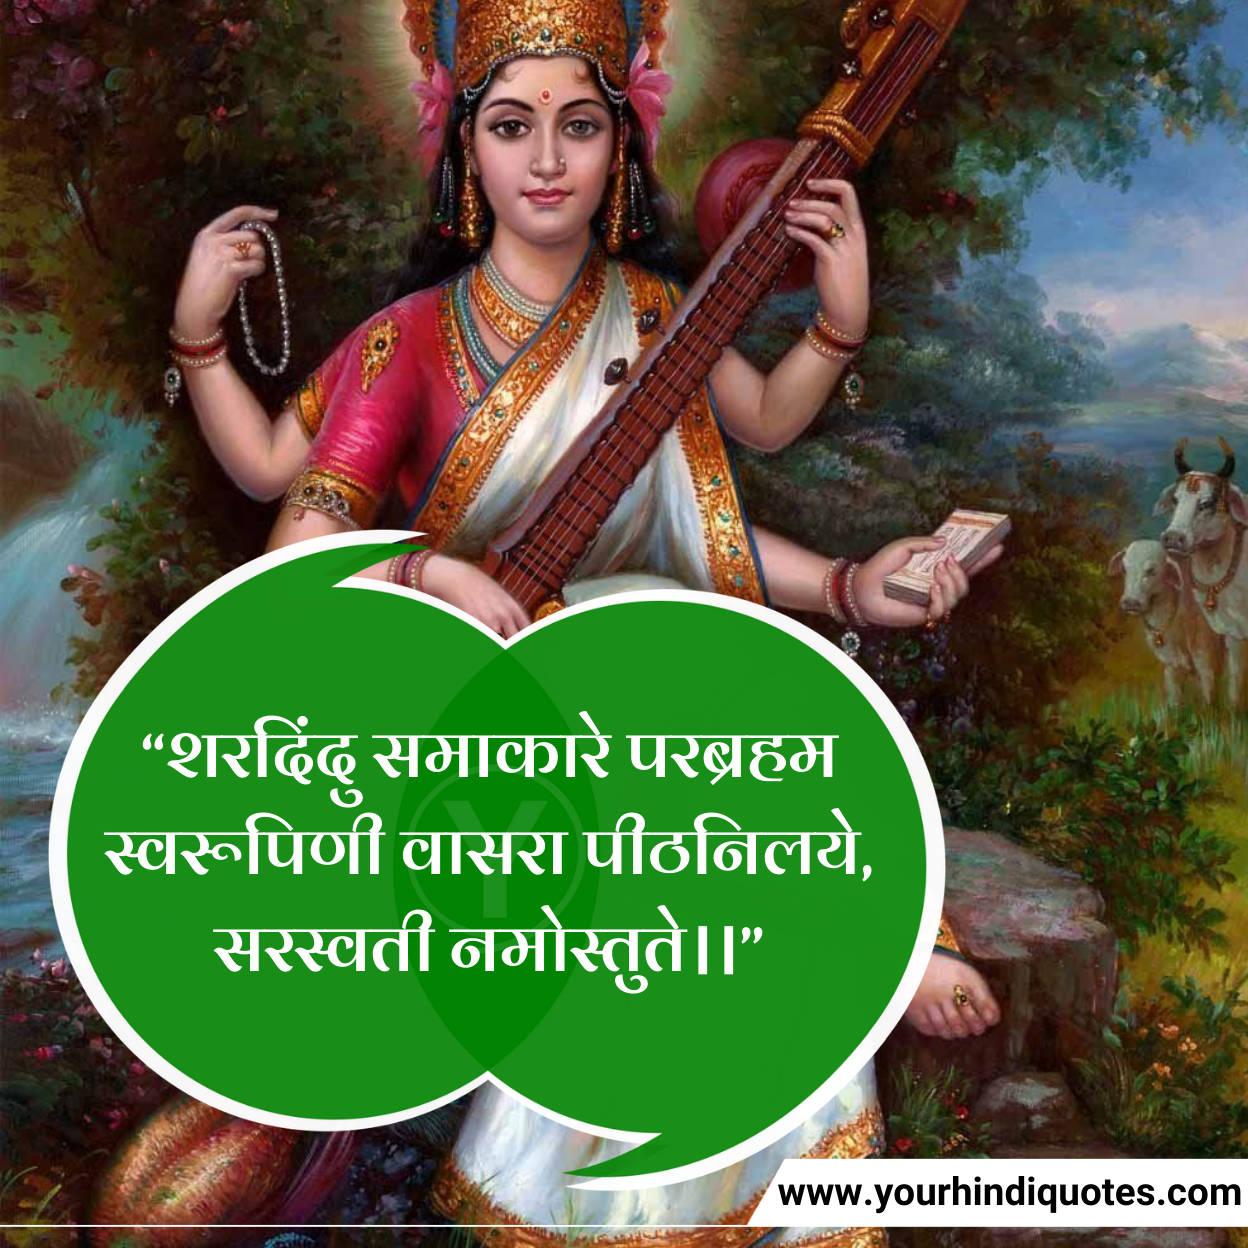 saraswati mantra Images